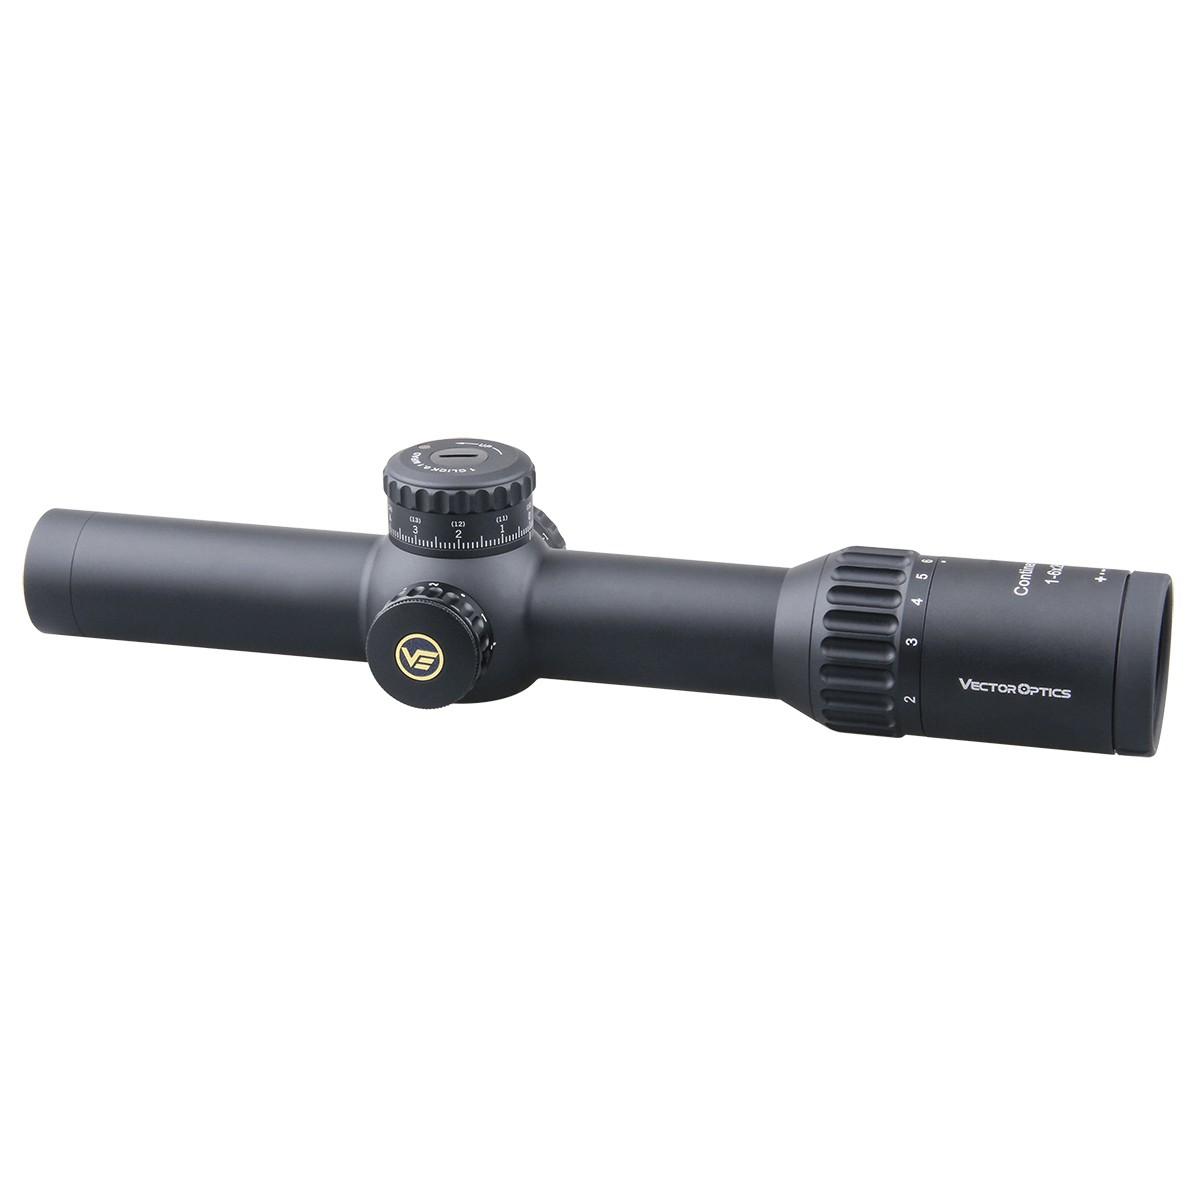 34mm Continental 1-6x28FFP Riflescope